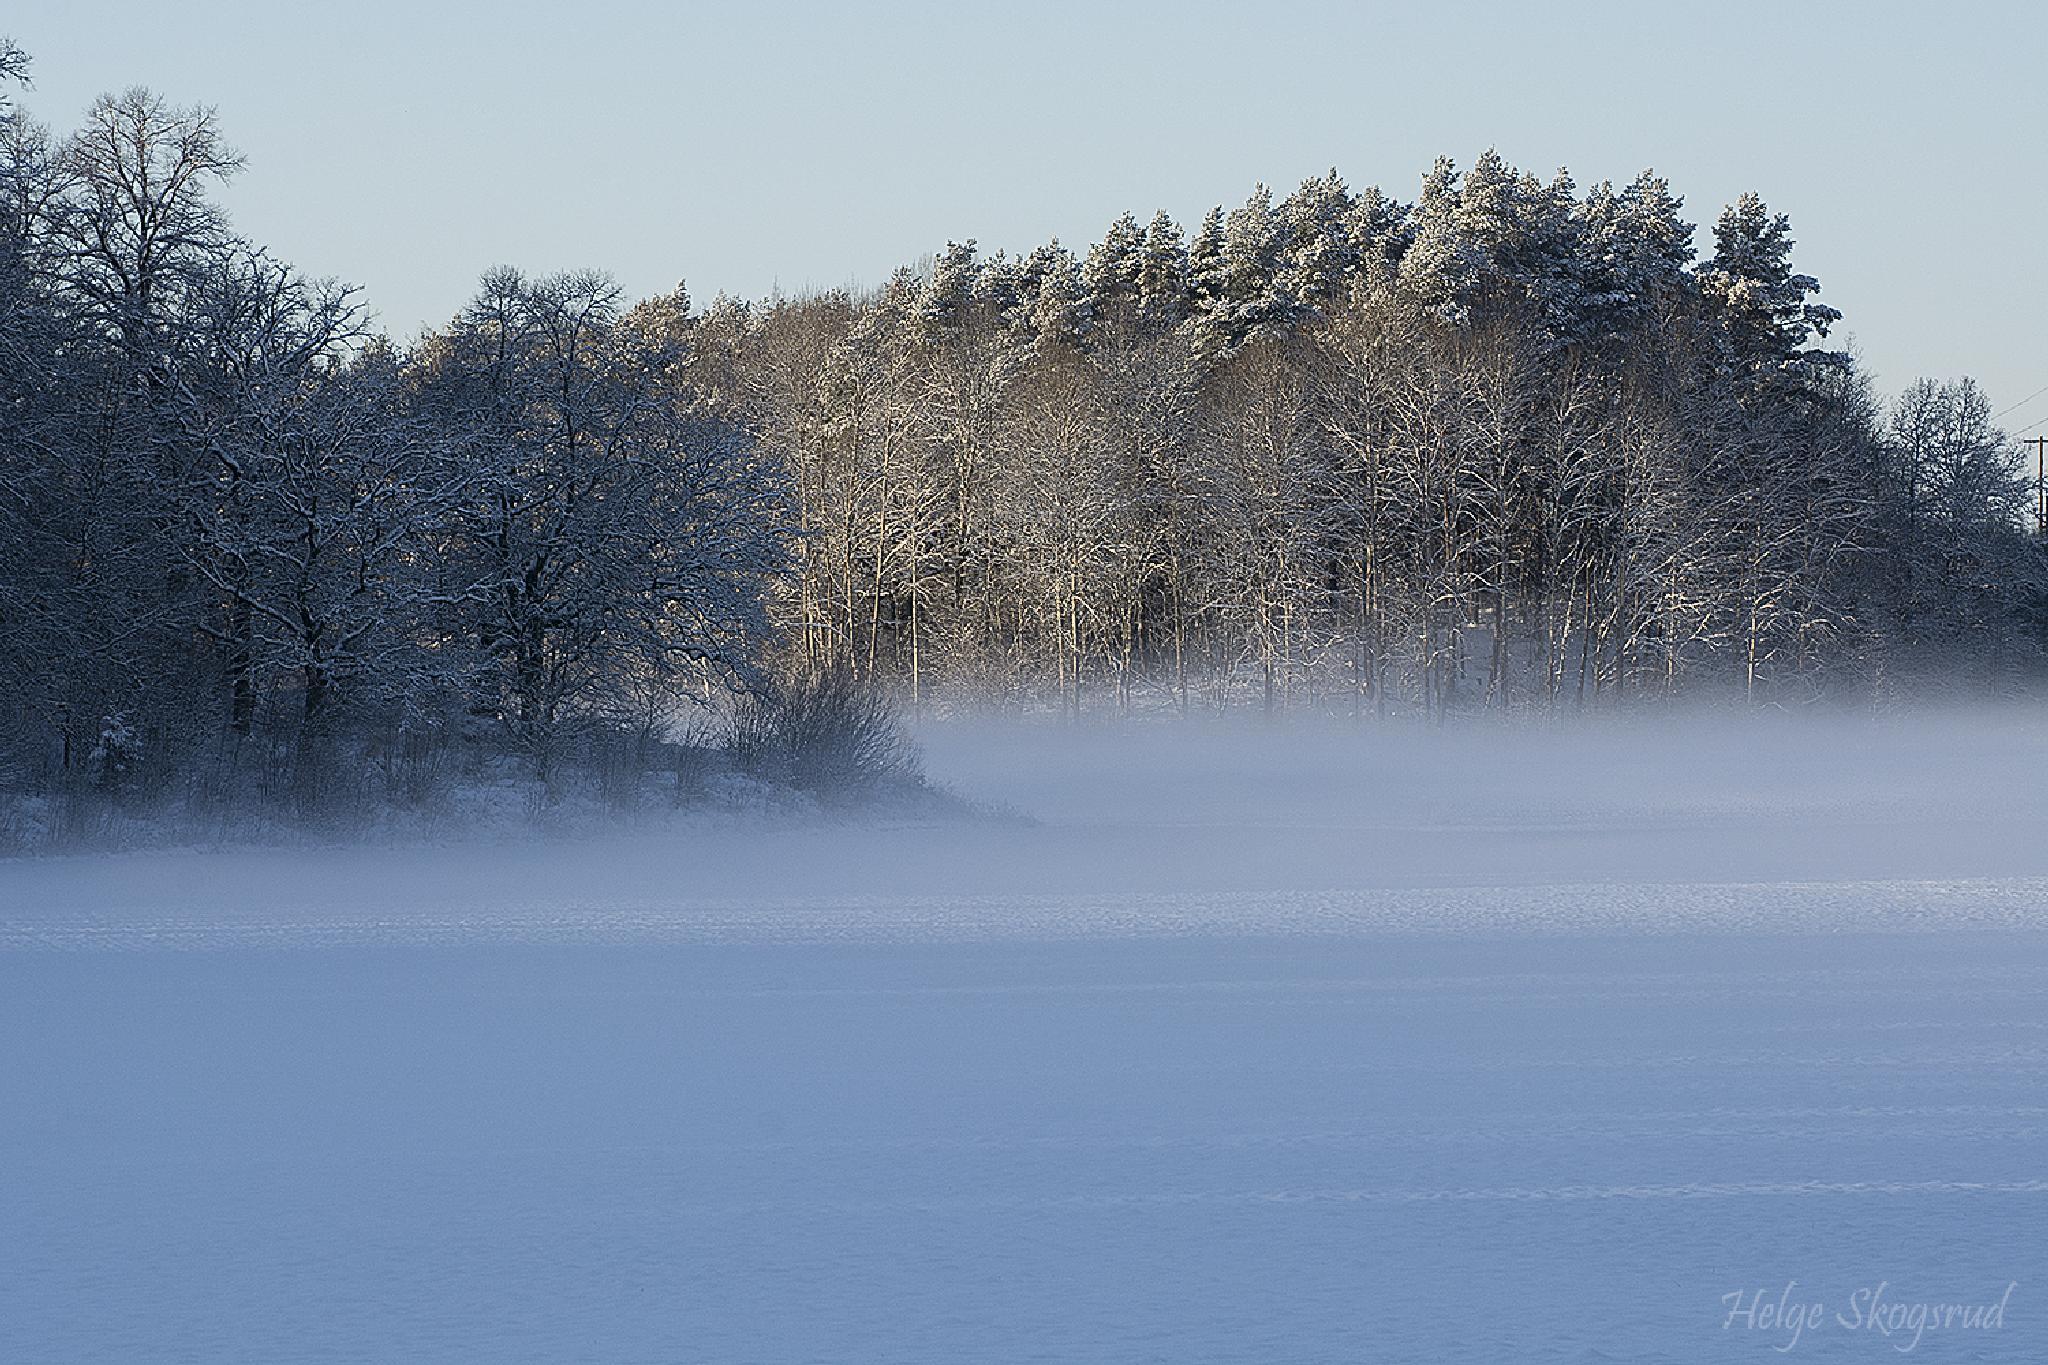 Cold winter day by Helge Skogsrud